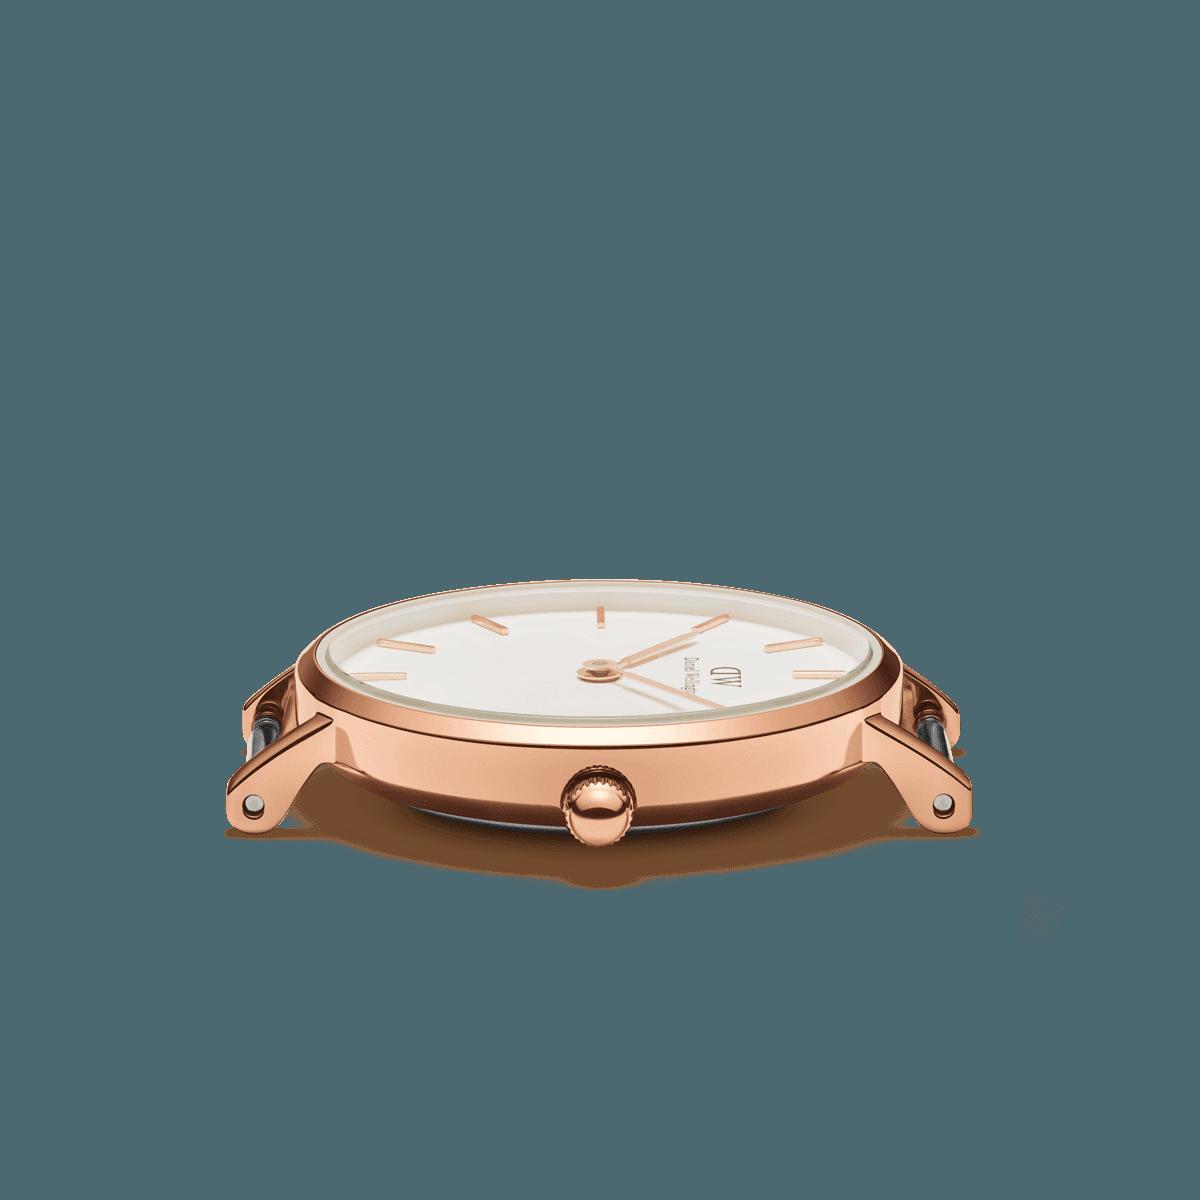 dw官网 dw手表官网 dw中国官网 dw官方旗舰店 DW DW官网  Bundle W+B Petite 28 Canterbury +Classic Bracelet S RG